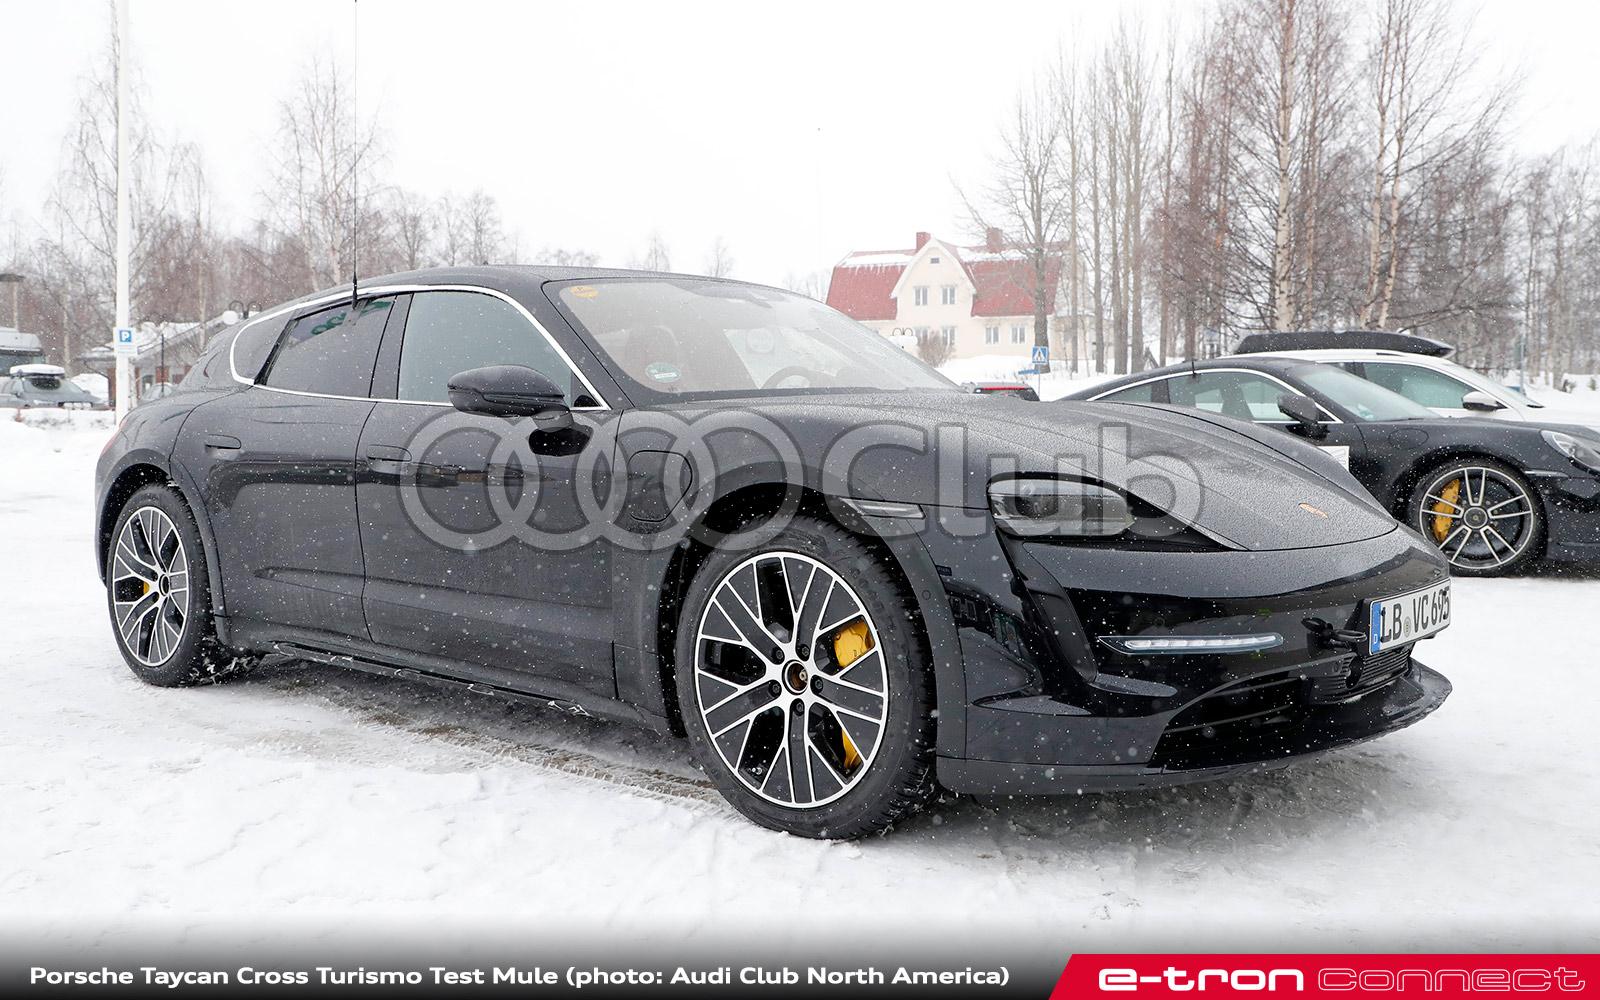 Could Porsche Taycan Cross Turismo Mean Chances of e-tron GT allroad?